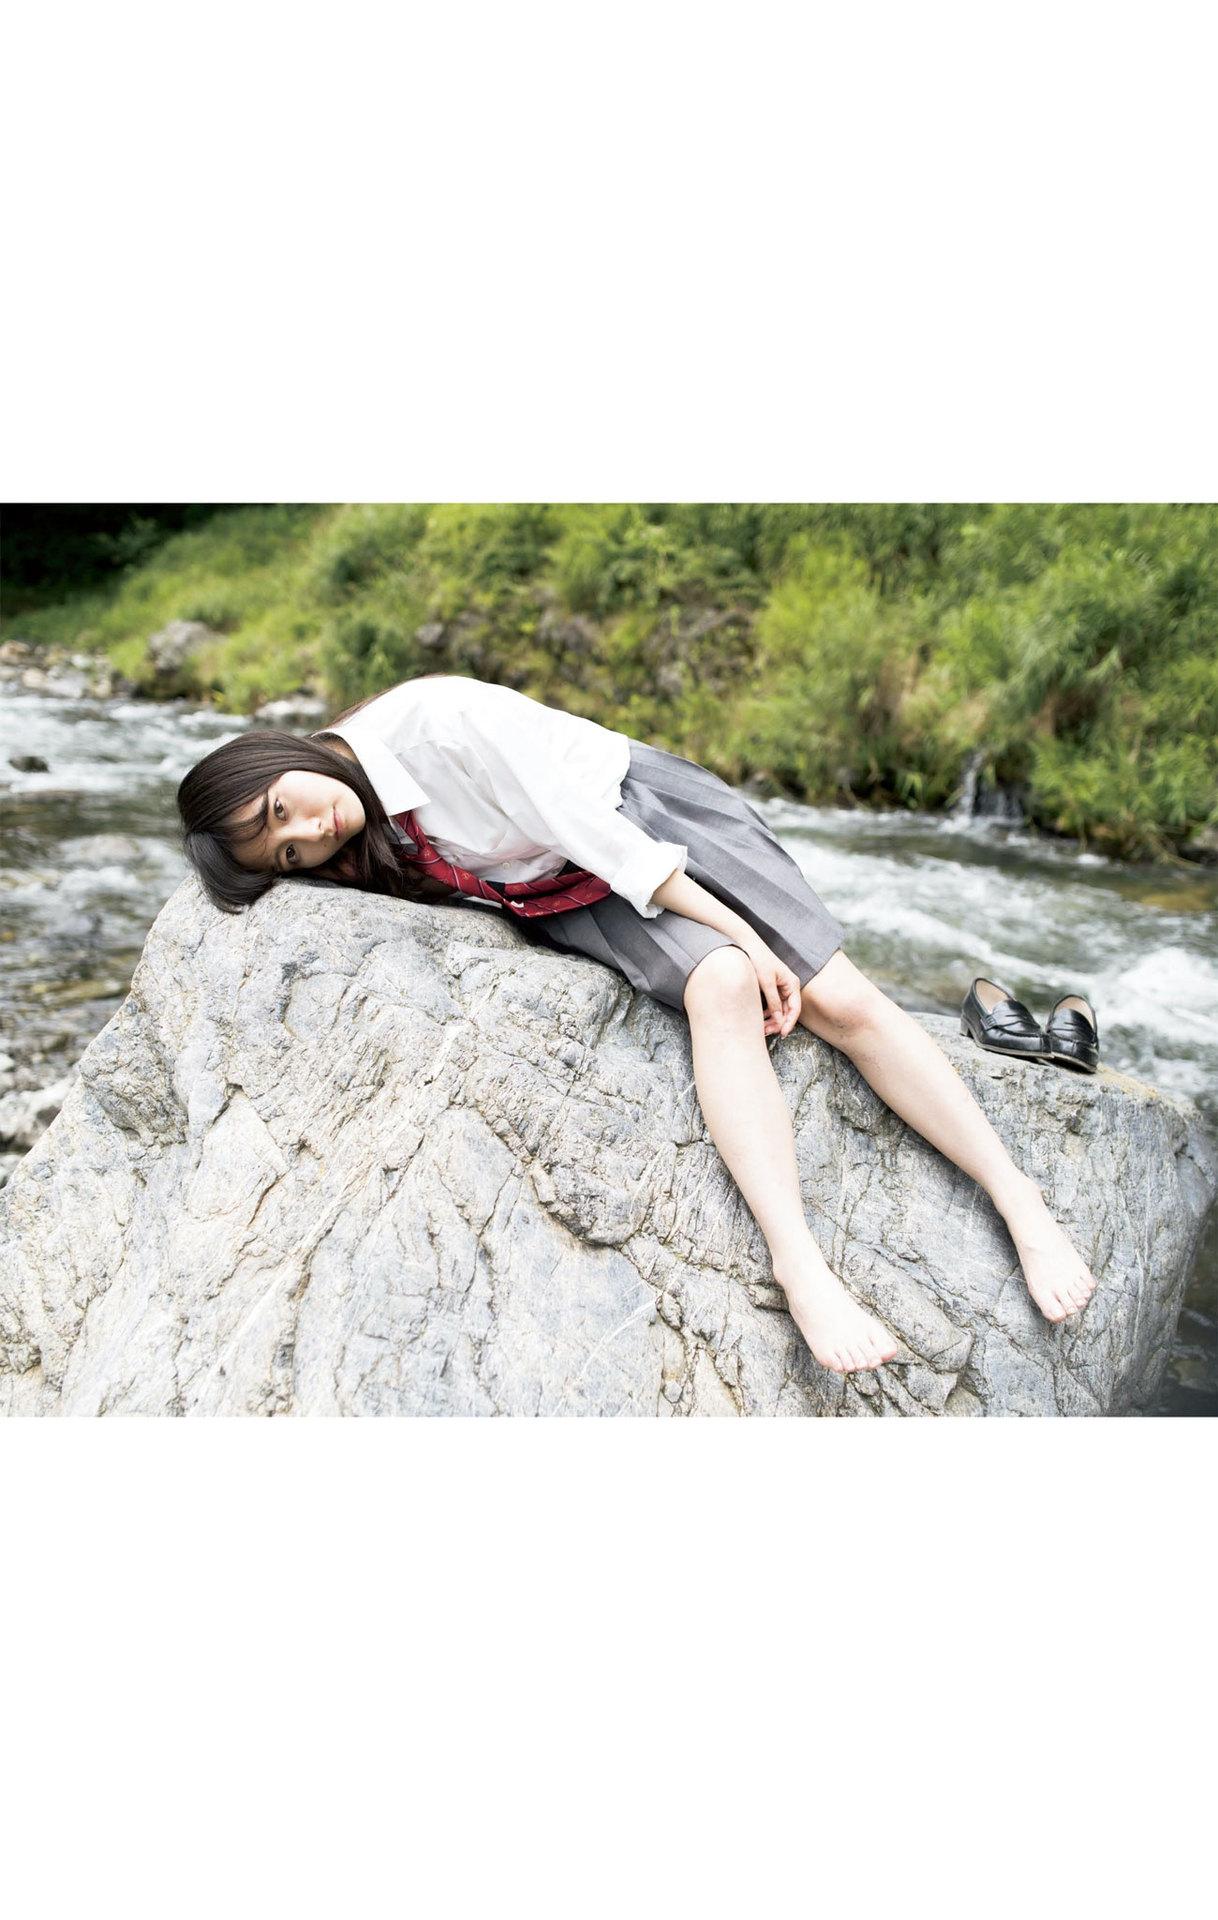 Summer Vacation Uniform After School Youth Bikini069